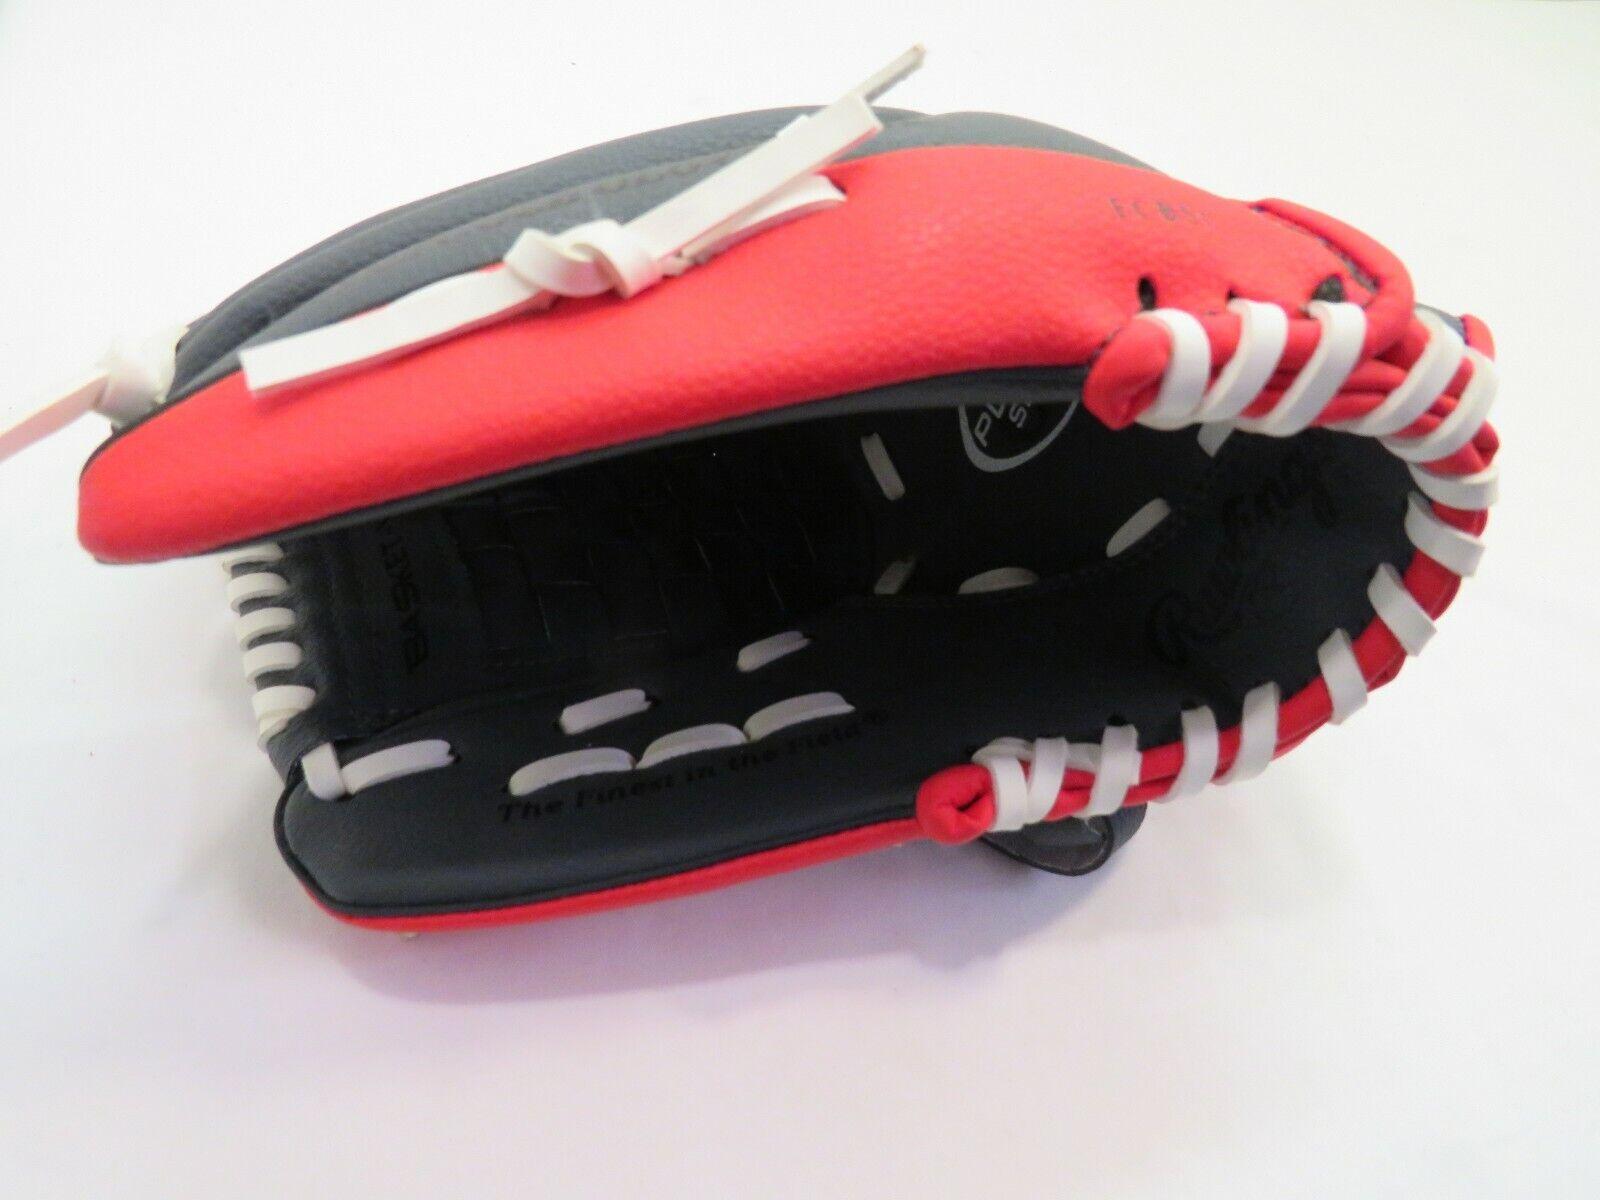 Rawlings PL115G Player Series Youth Baseball Glove RH 11.5 Black Red  - $6.99